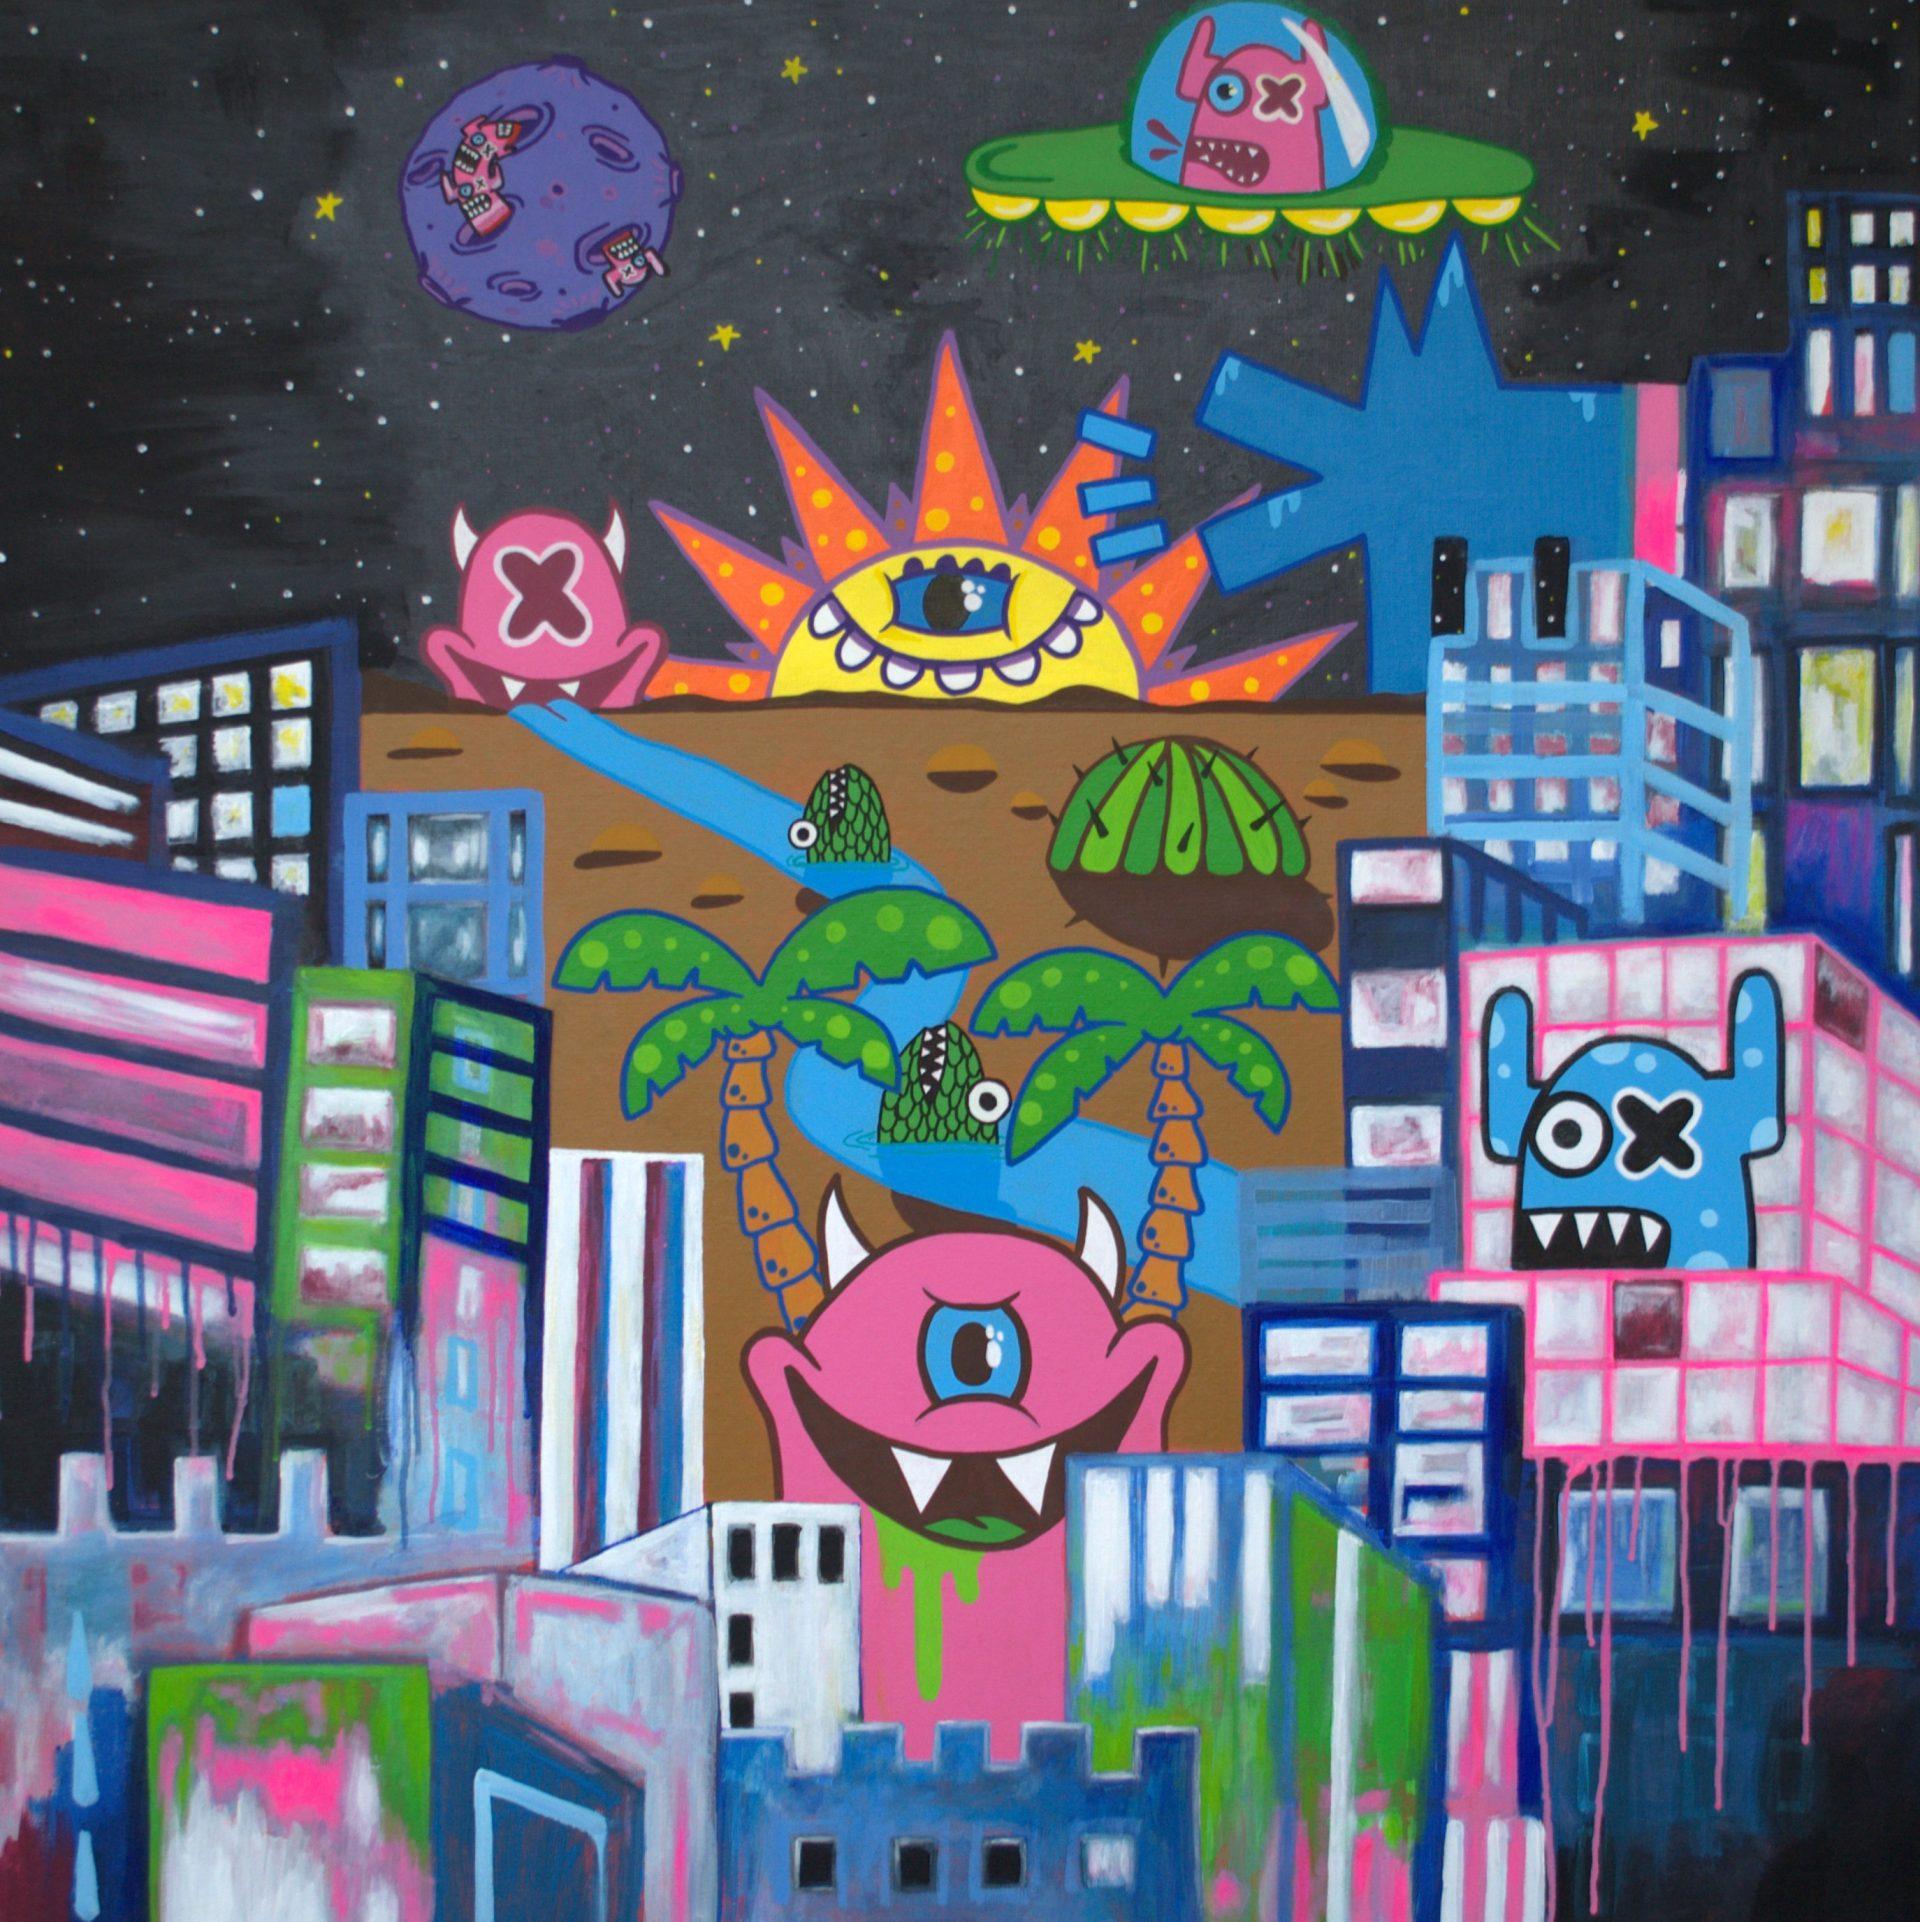 kunstenaar-utrecht-kunst-ltuziam-l-tuziasm-schilderij-art-artist-painting-urban-landscape-city-OX Alien Out of Space